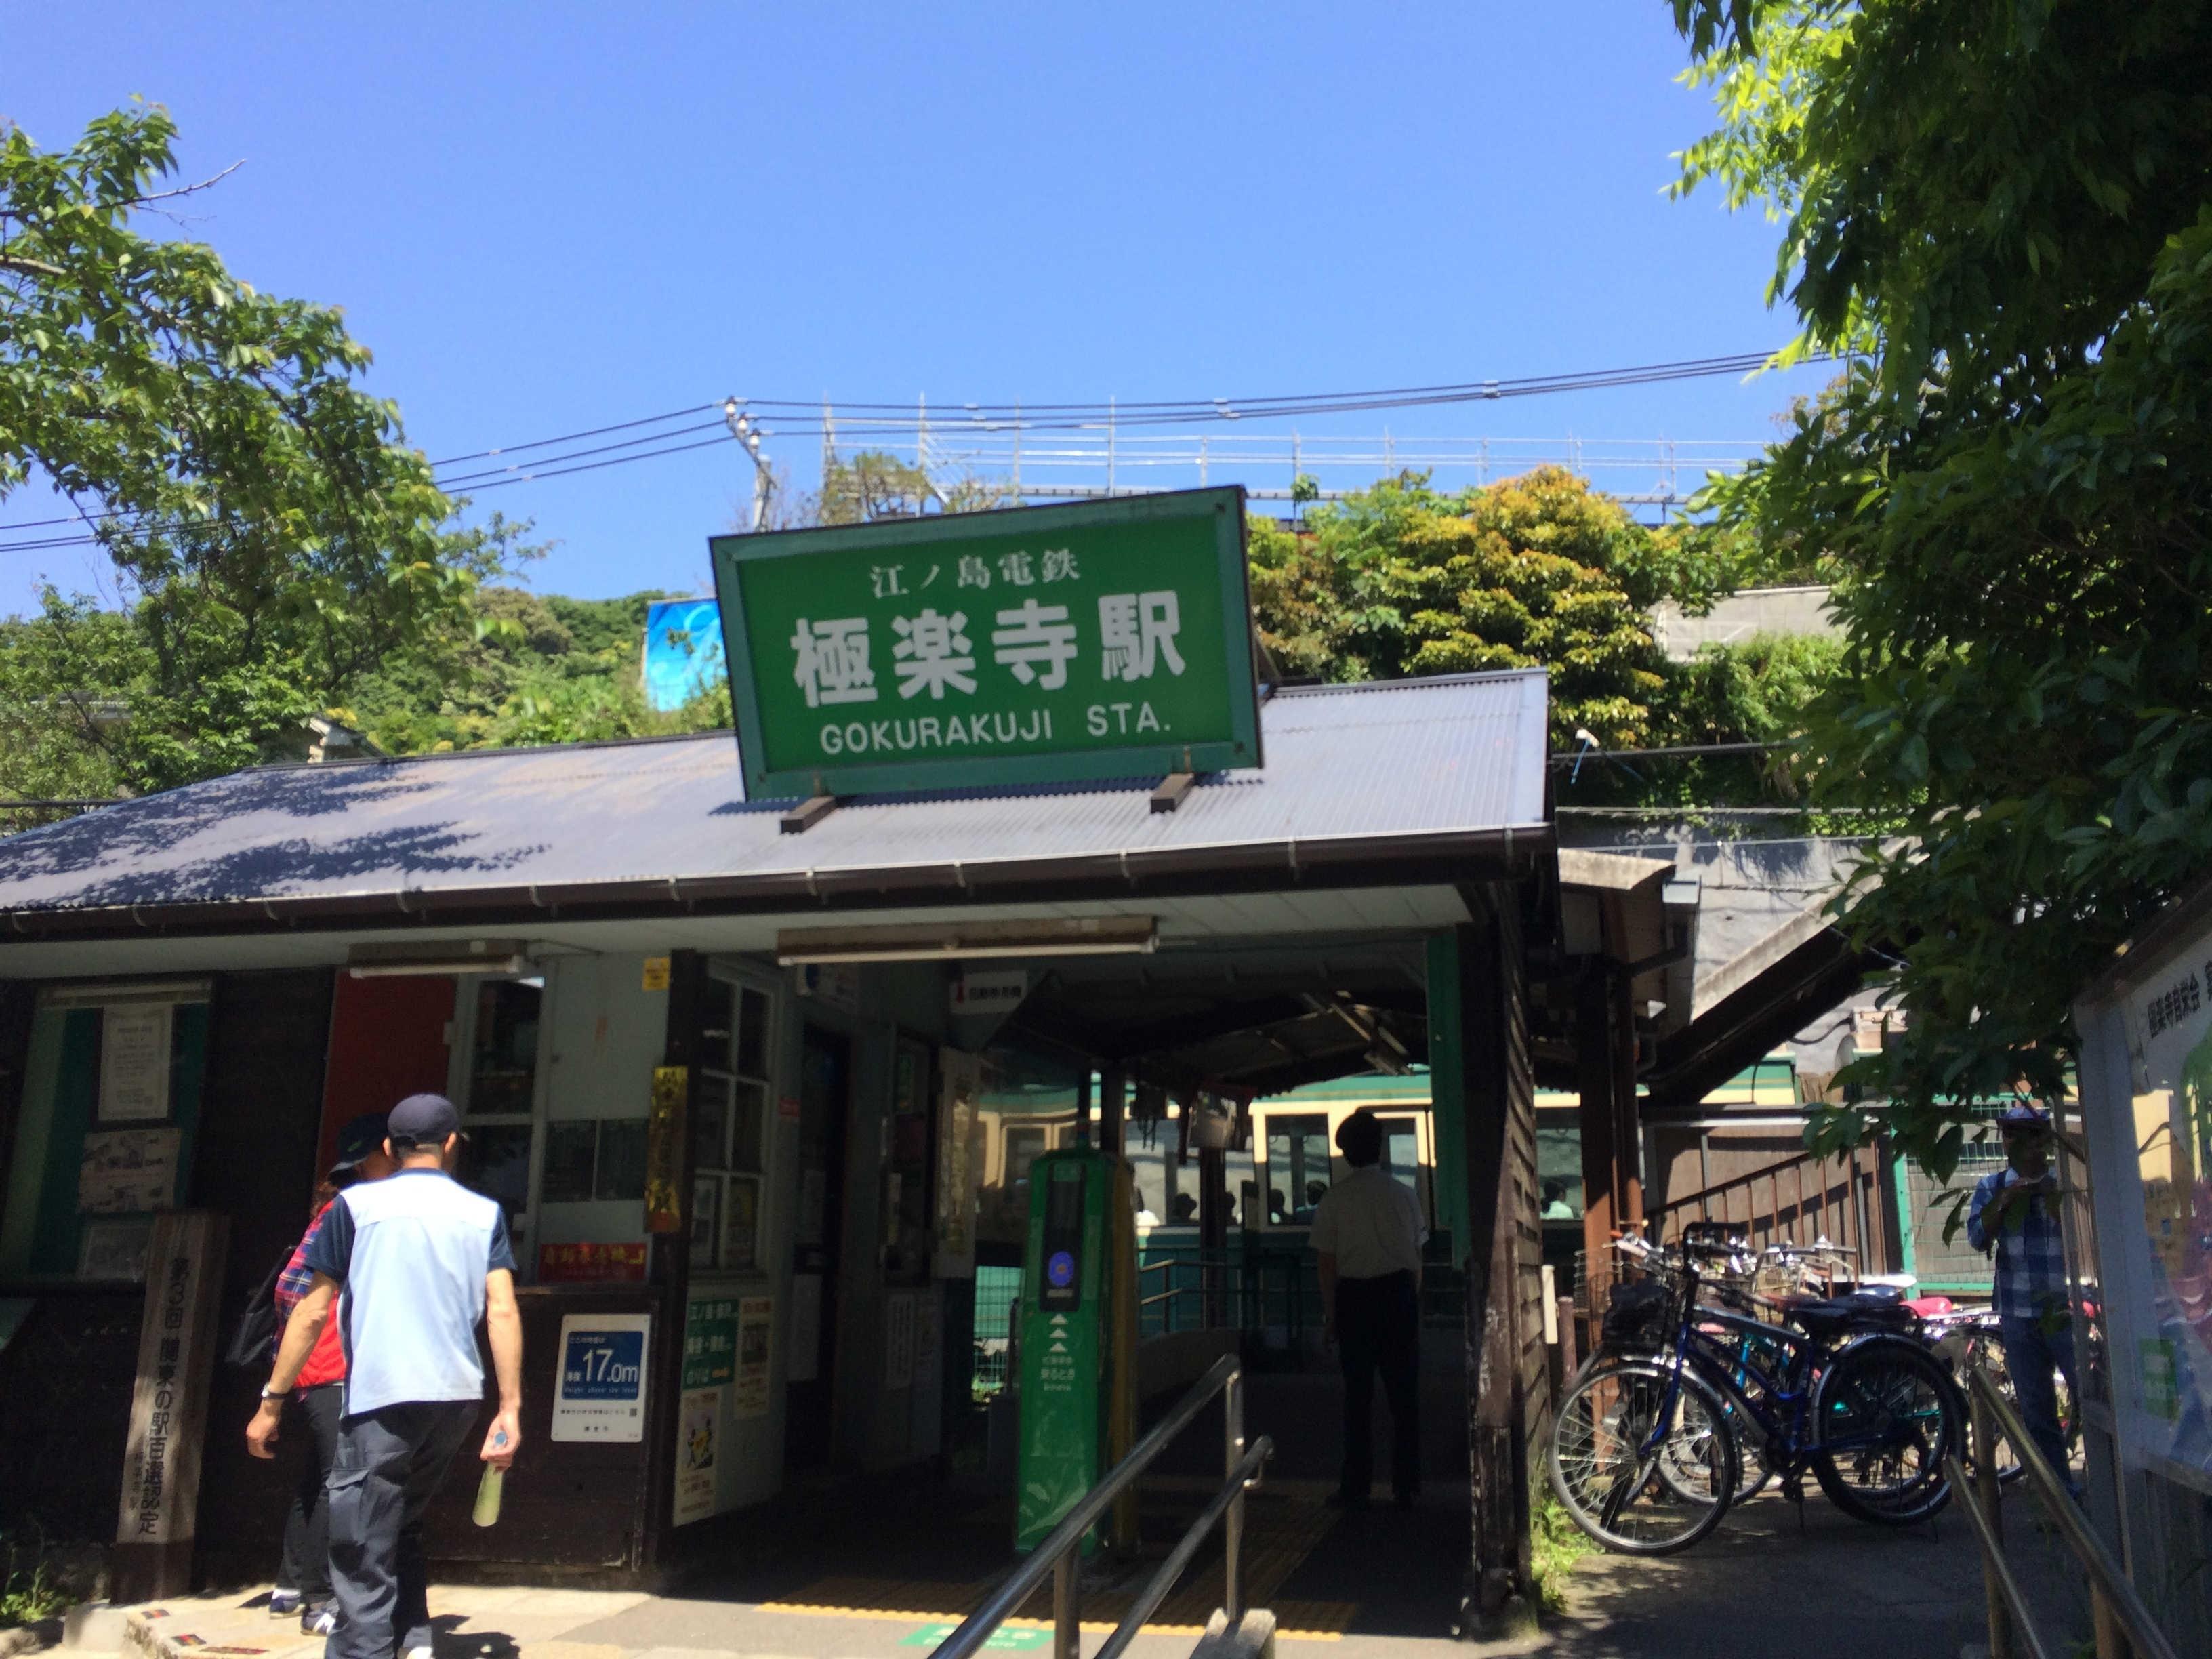 江ノ島電鉄「極楽寺駅」(スタート)